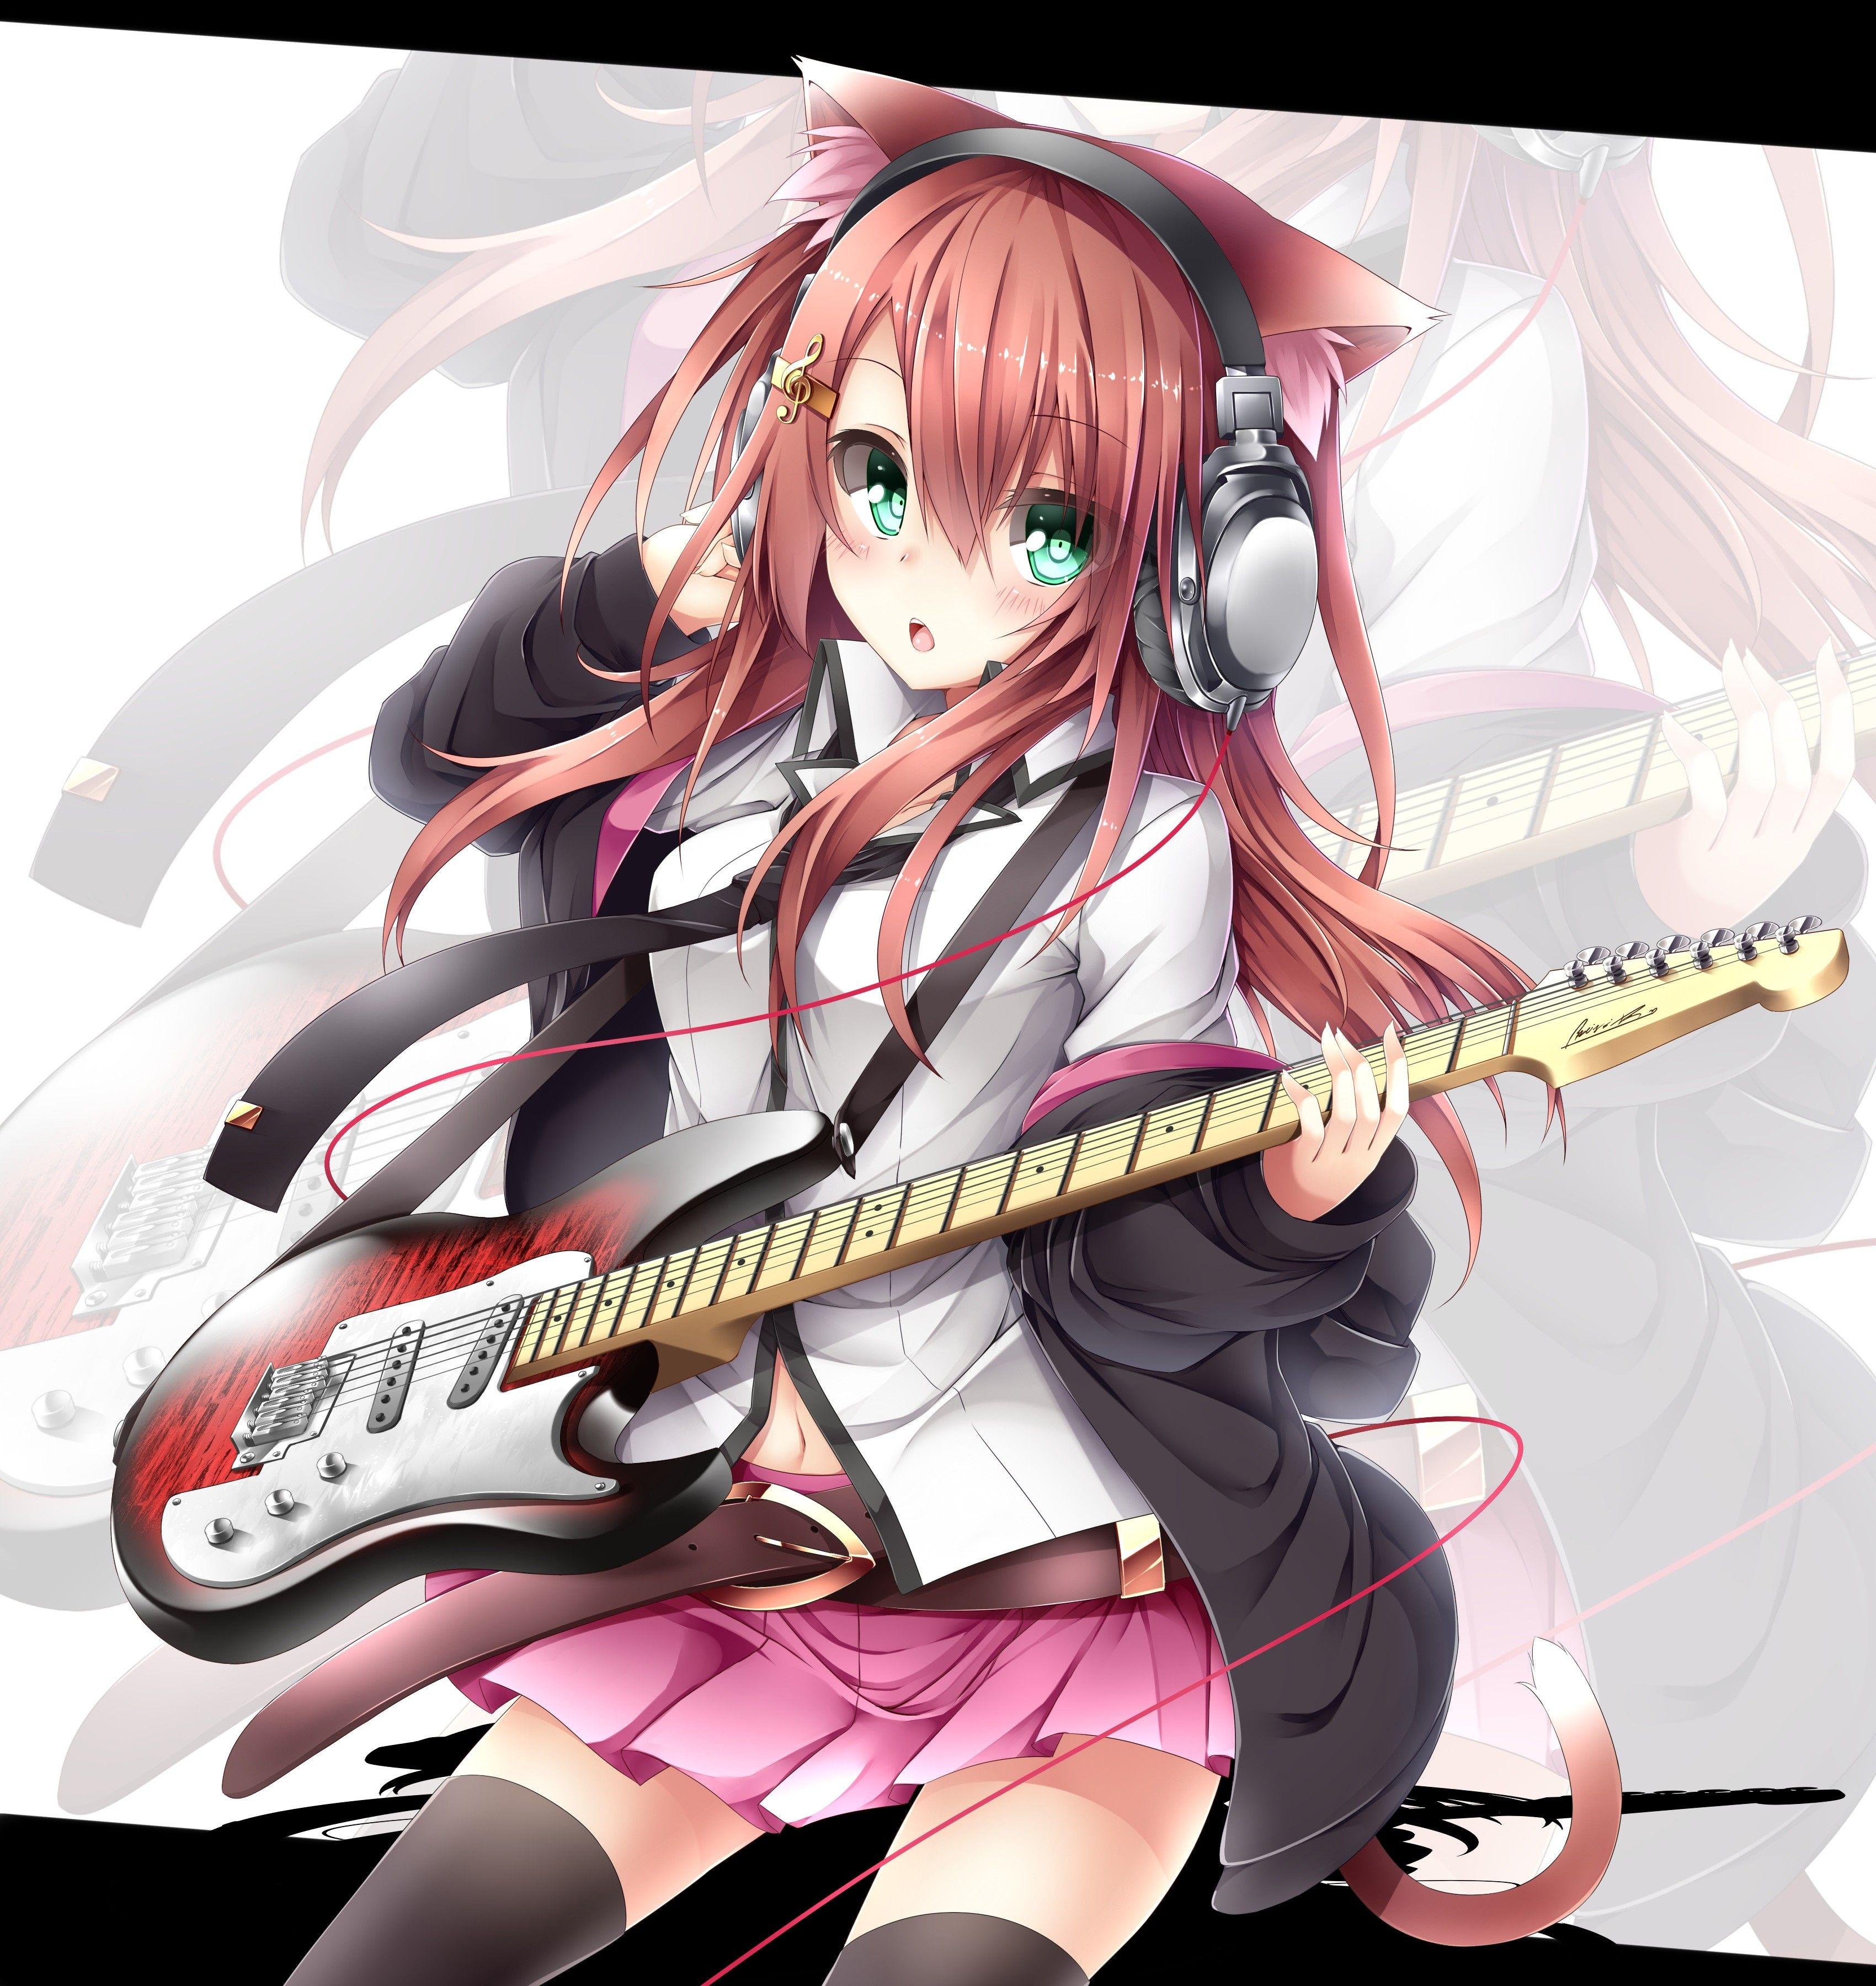 Animal Ears Anime Girls Electric Guitars Guitars Headphones Wallpaper 2893587 Wallbase Cc Cat Girl Nekomimi Anime